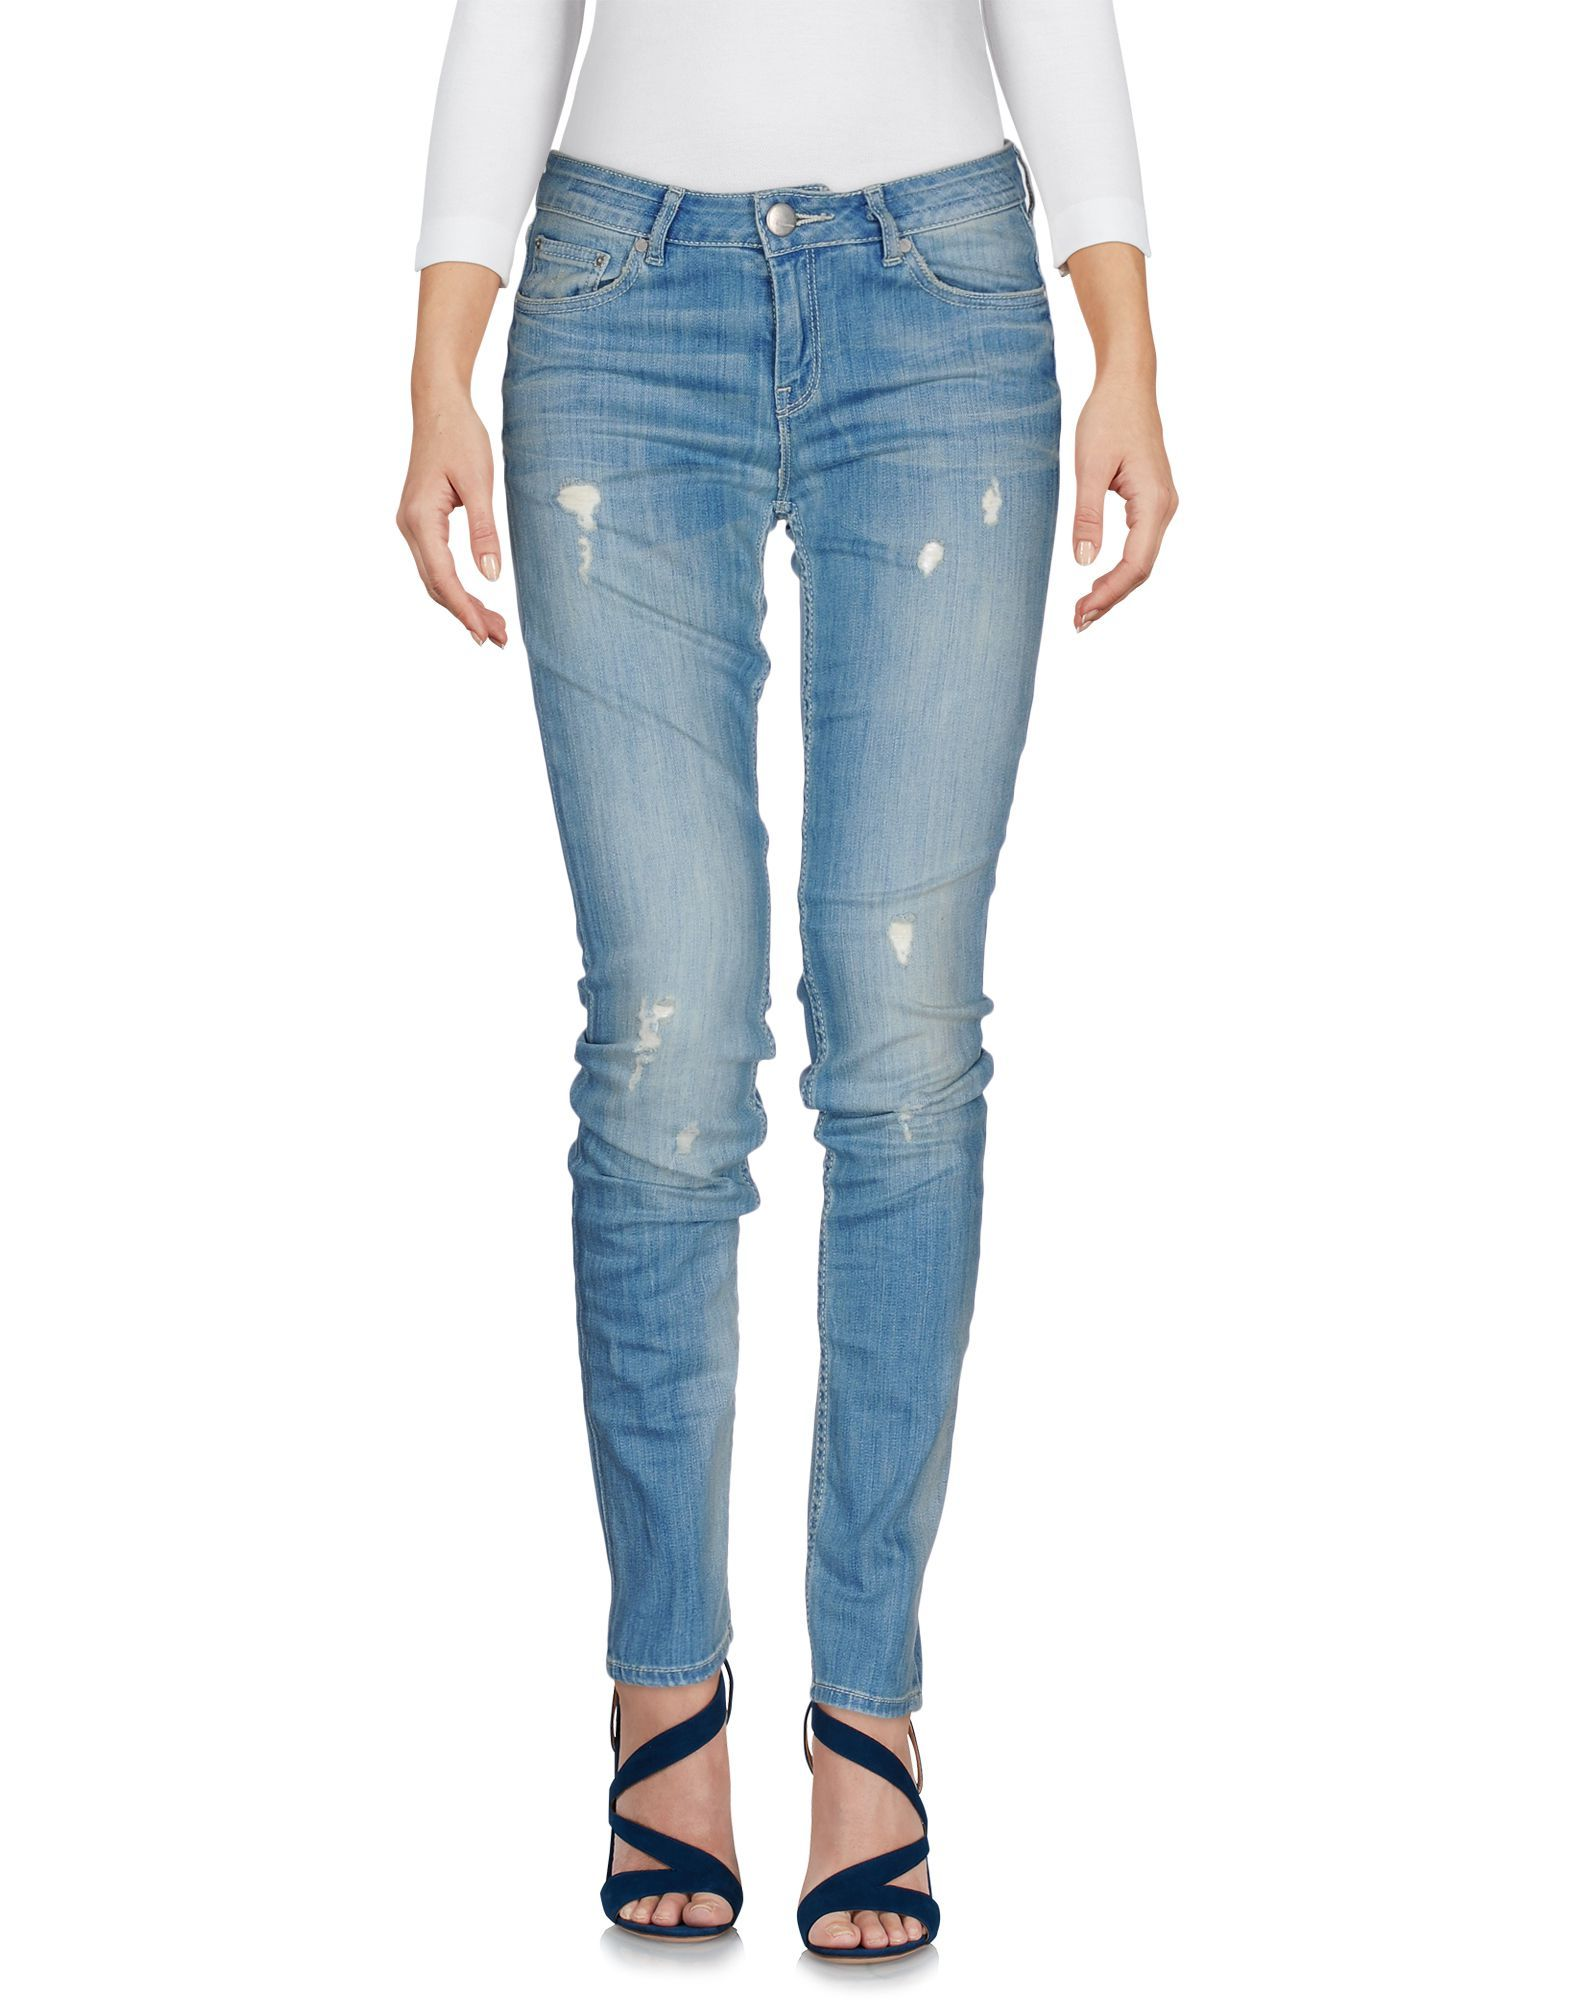 Silvian Heach Blue Cotton Skinny Jeans